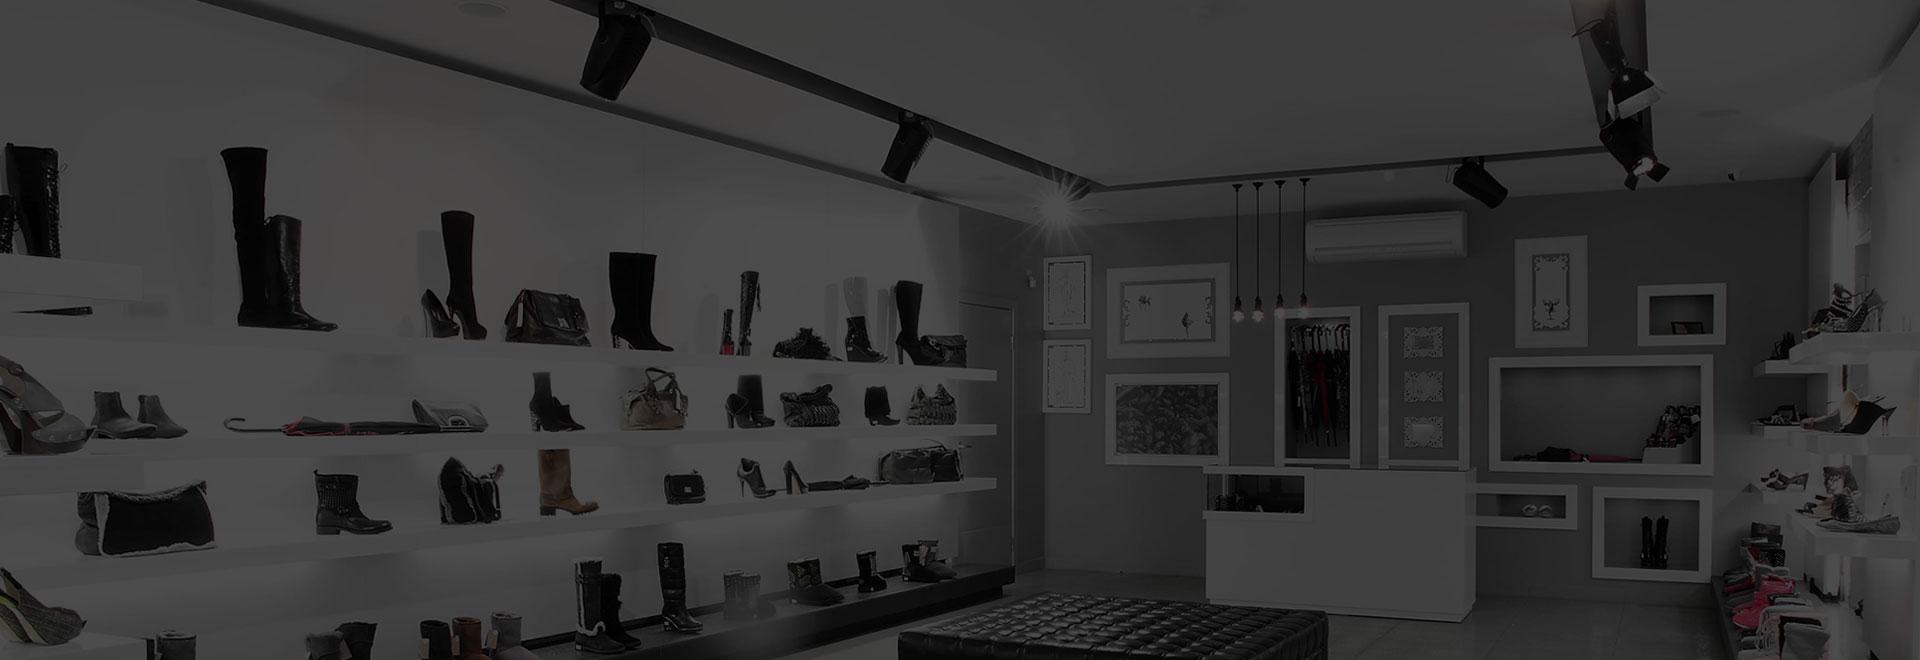 Property Valuations Retail Shop